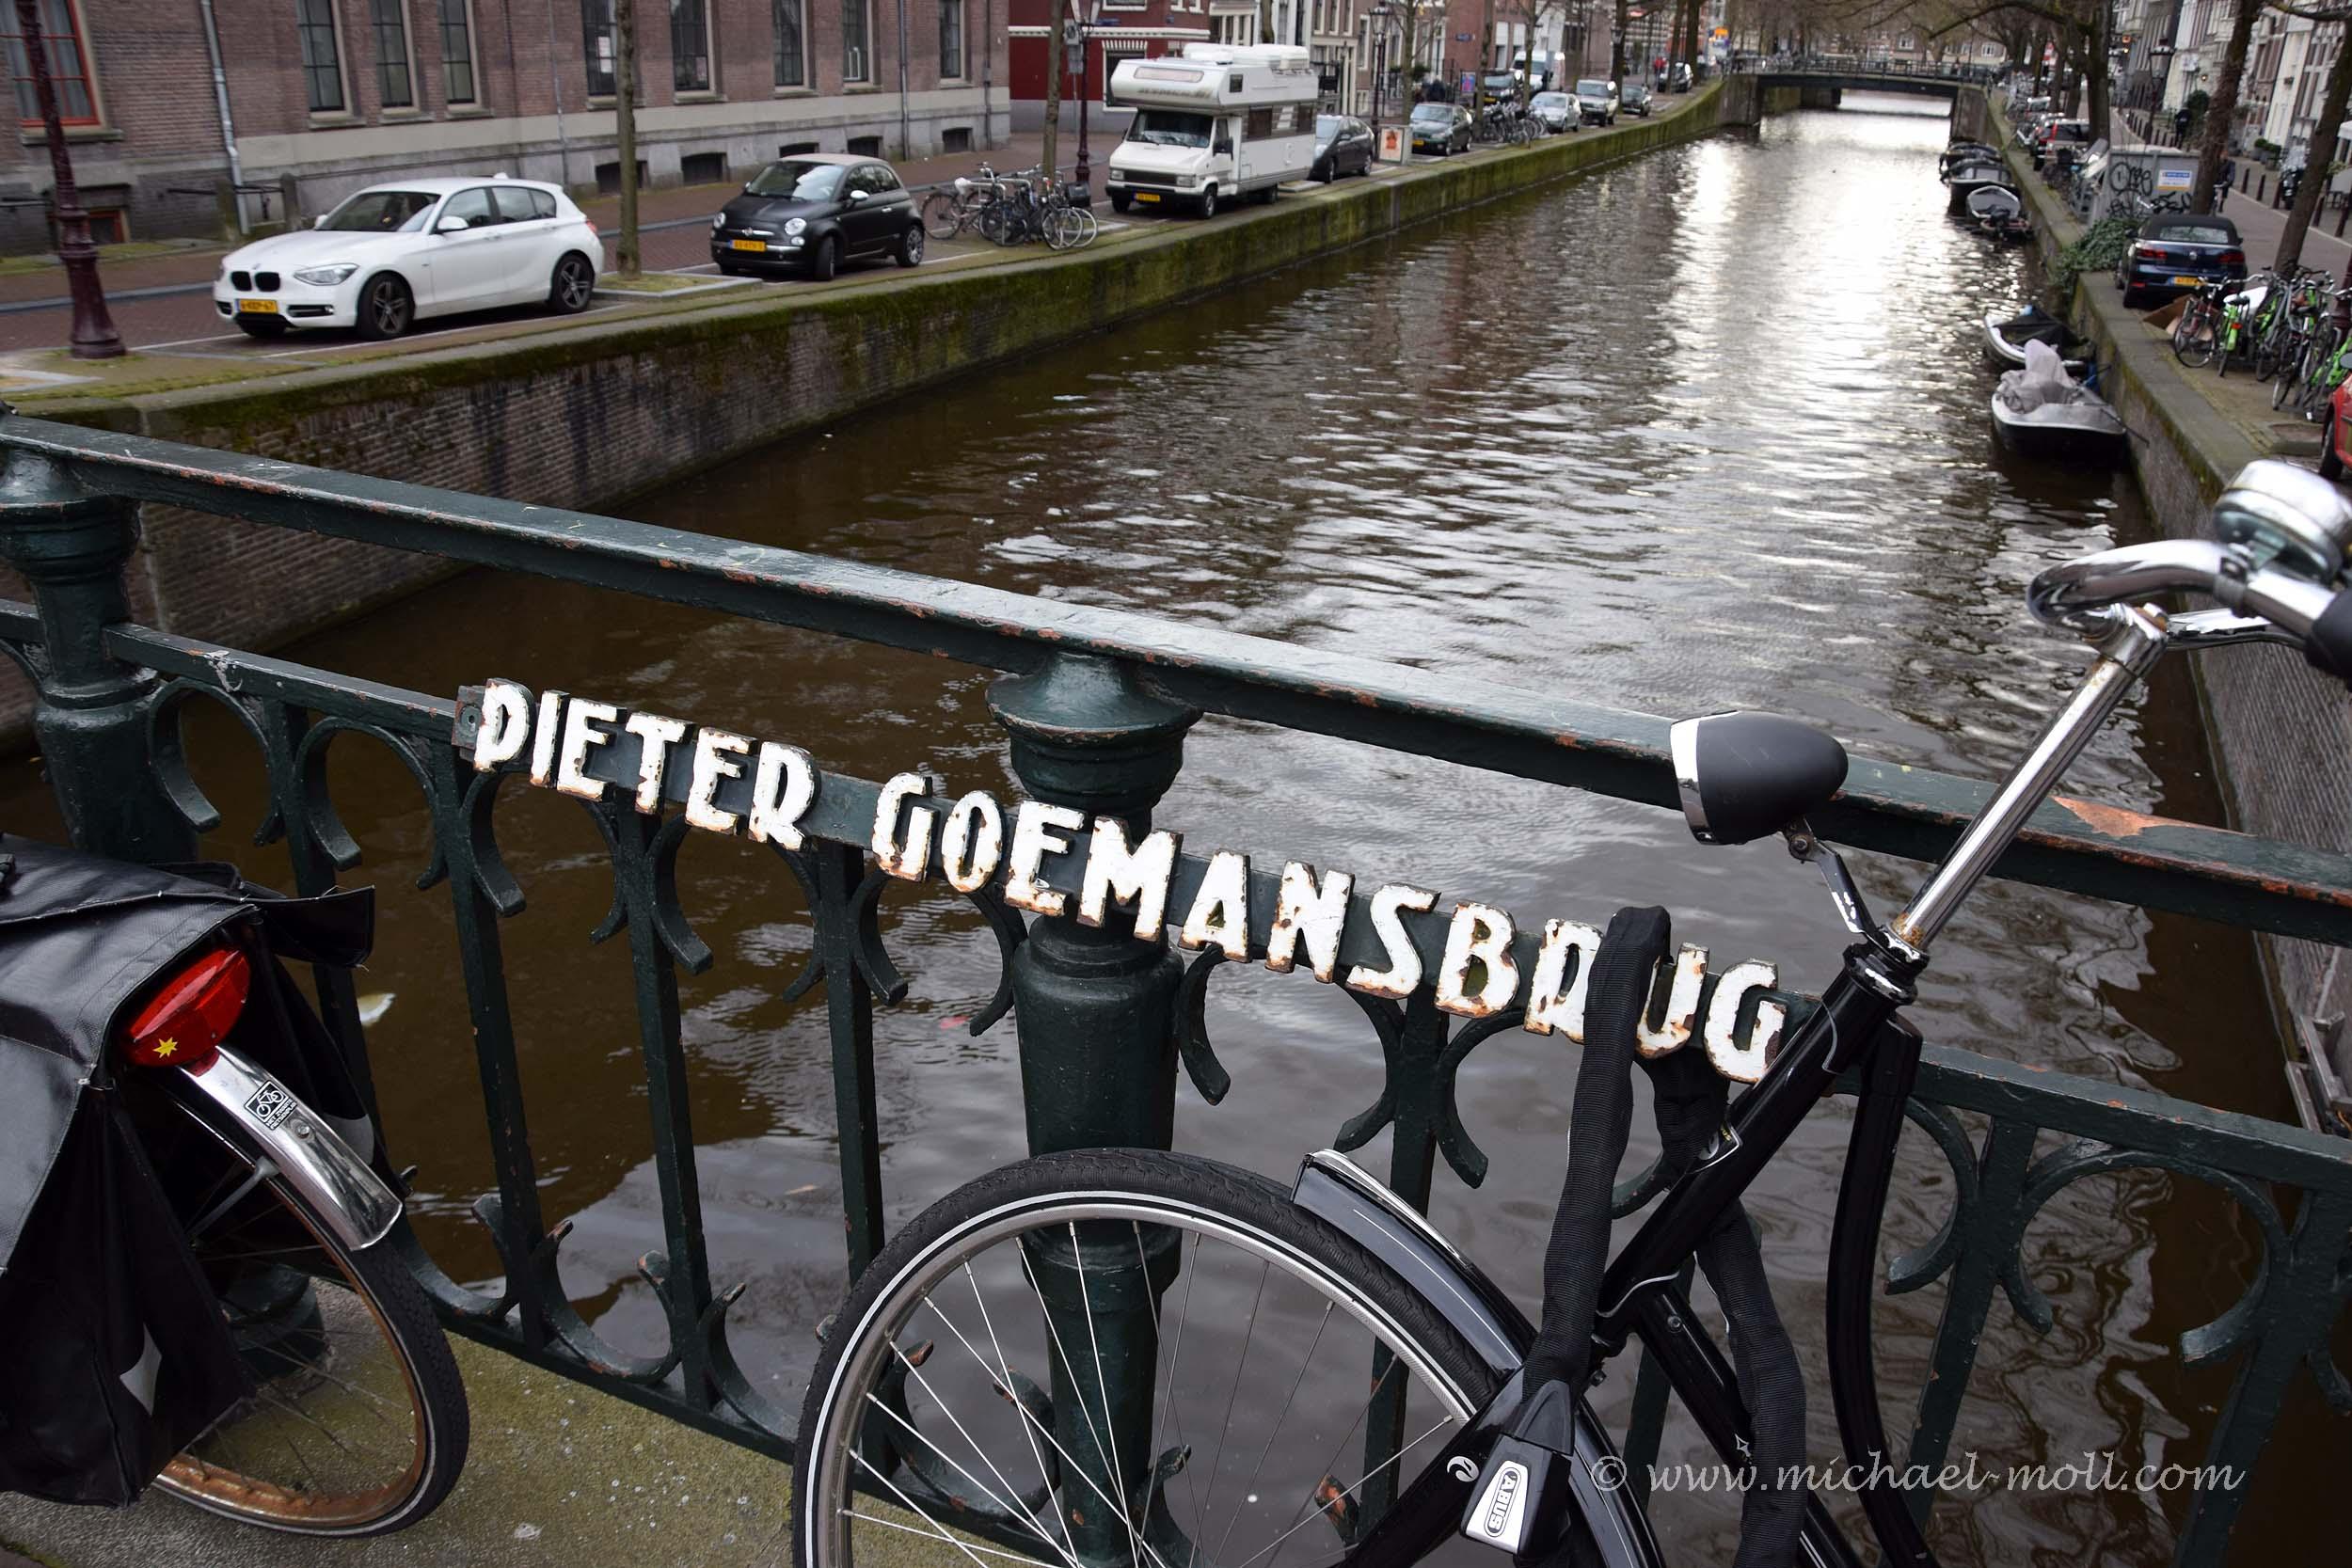 Pieter Goemansbrug